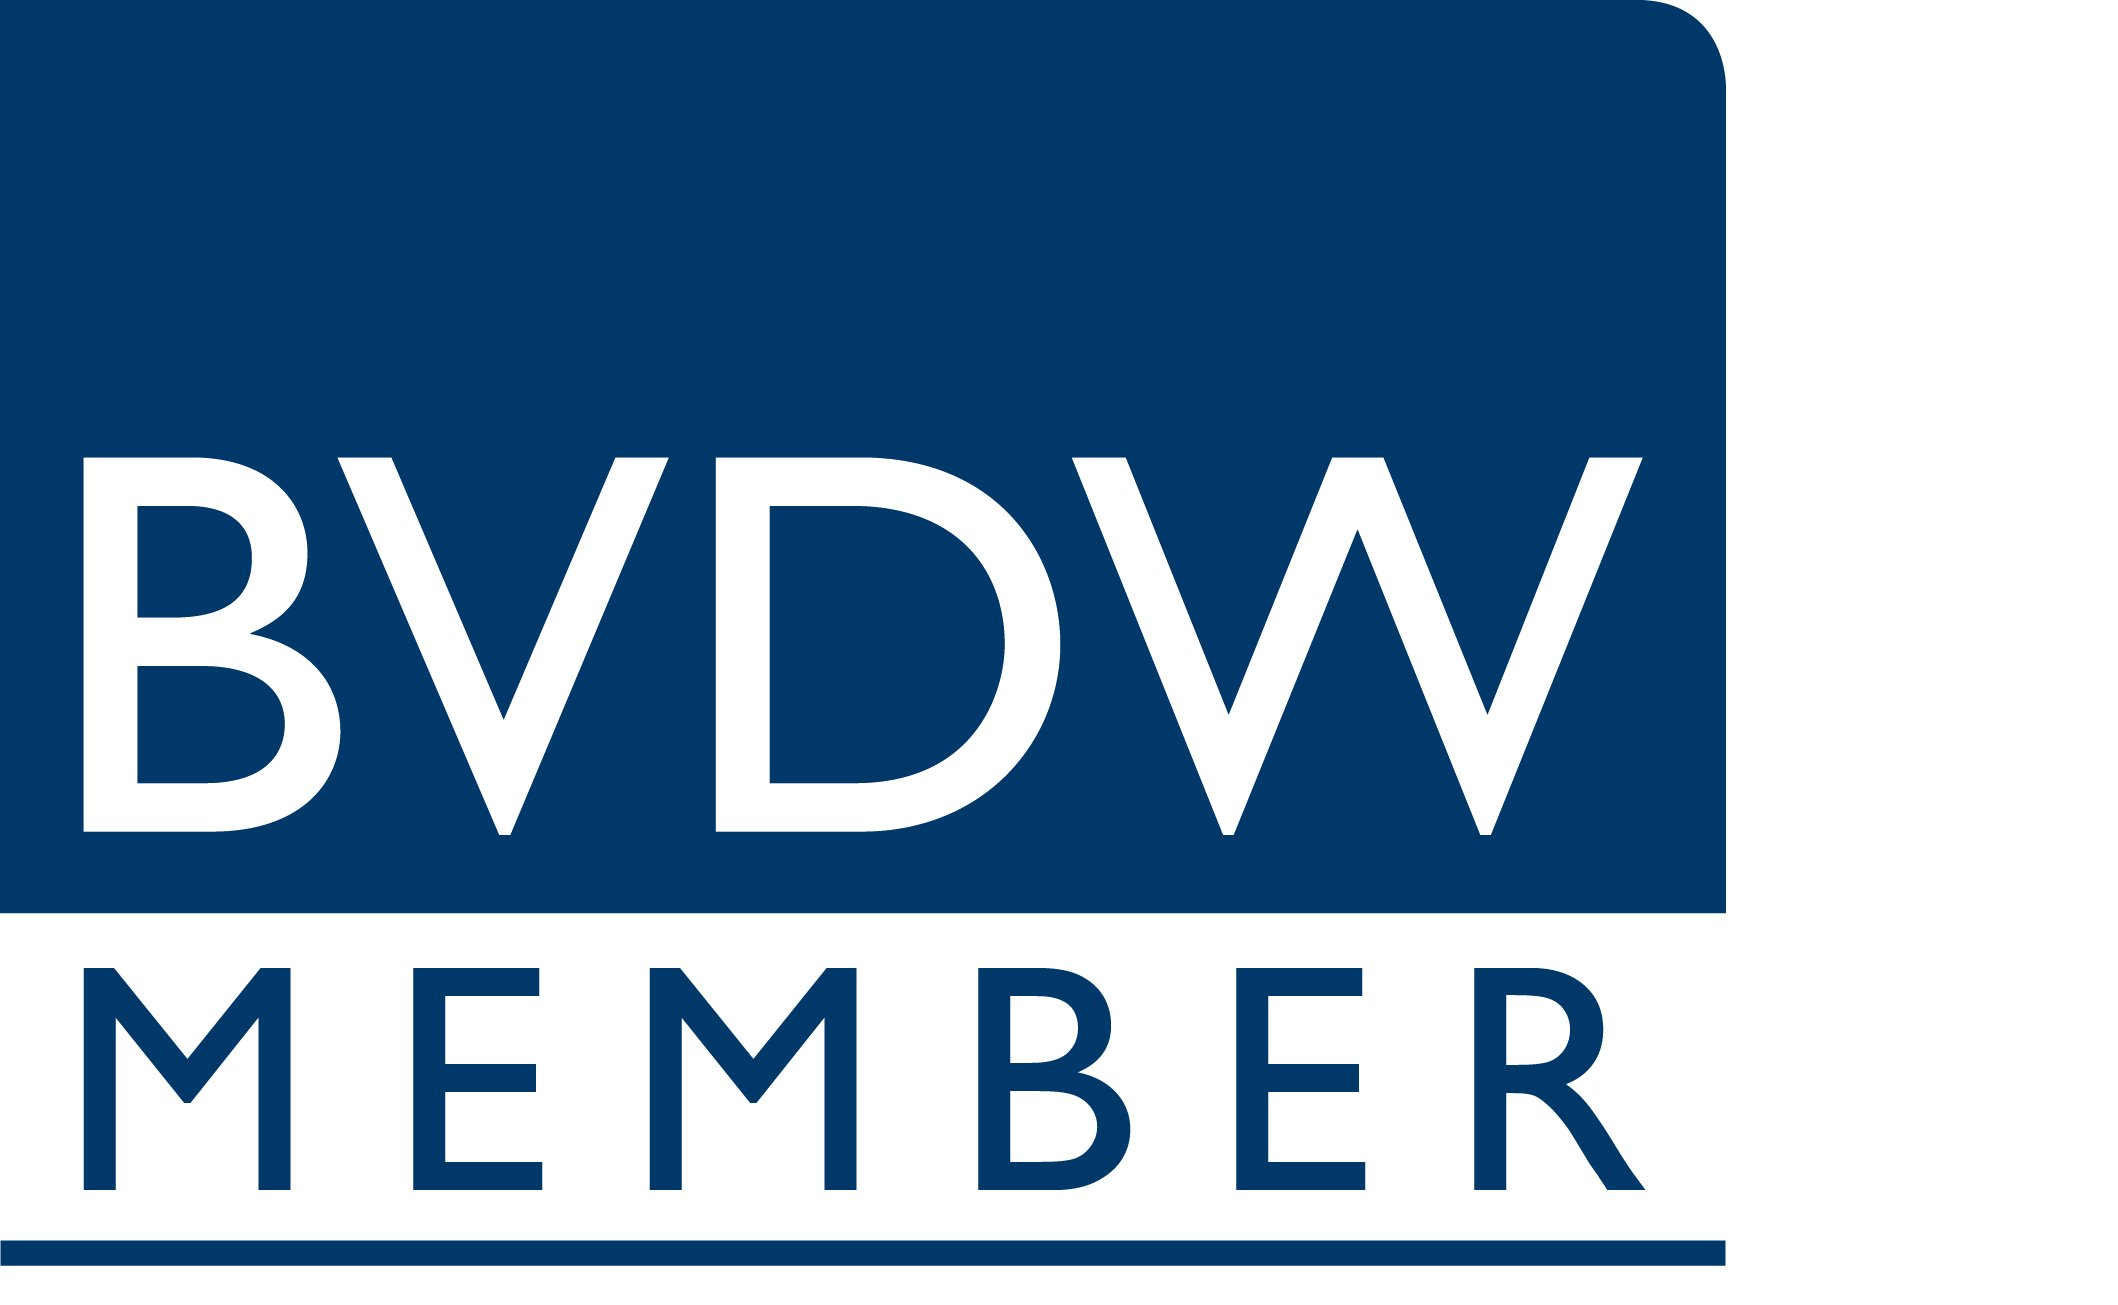 BVDW Member